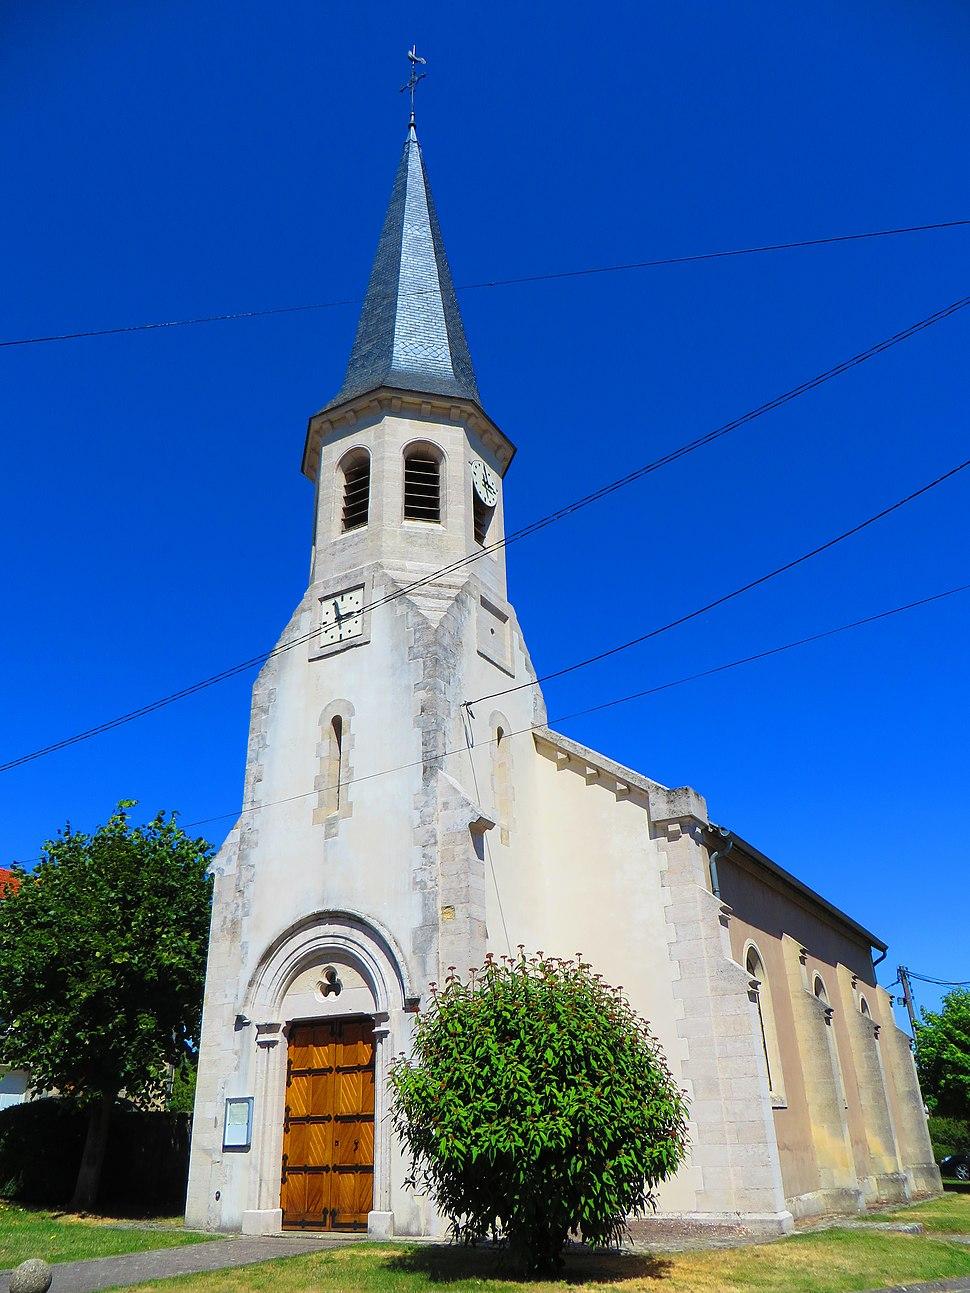 Skyline of Ronvaux